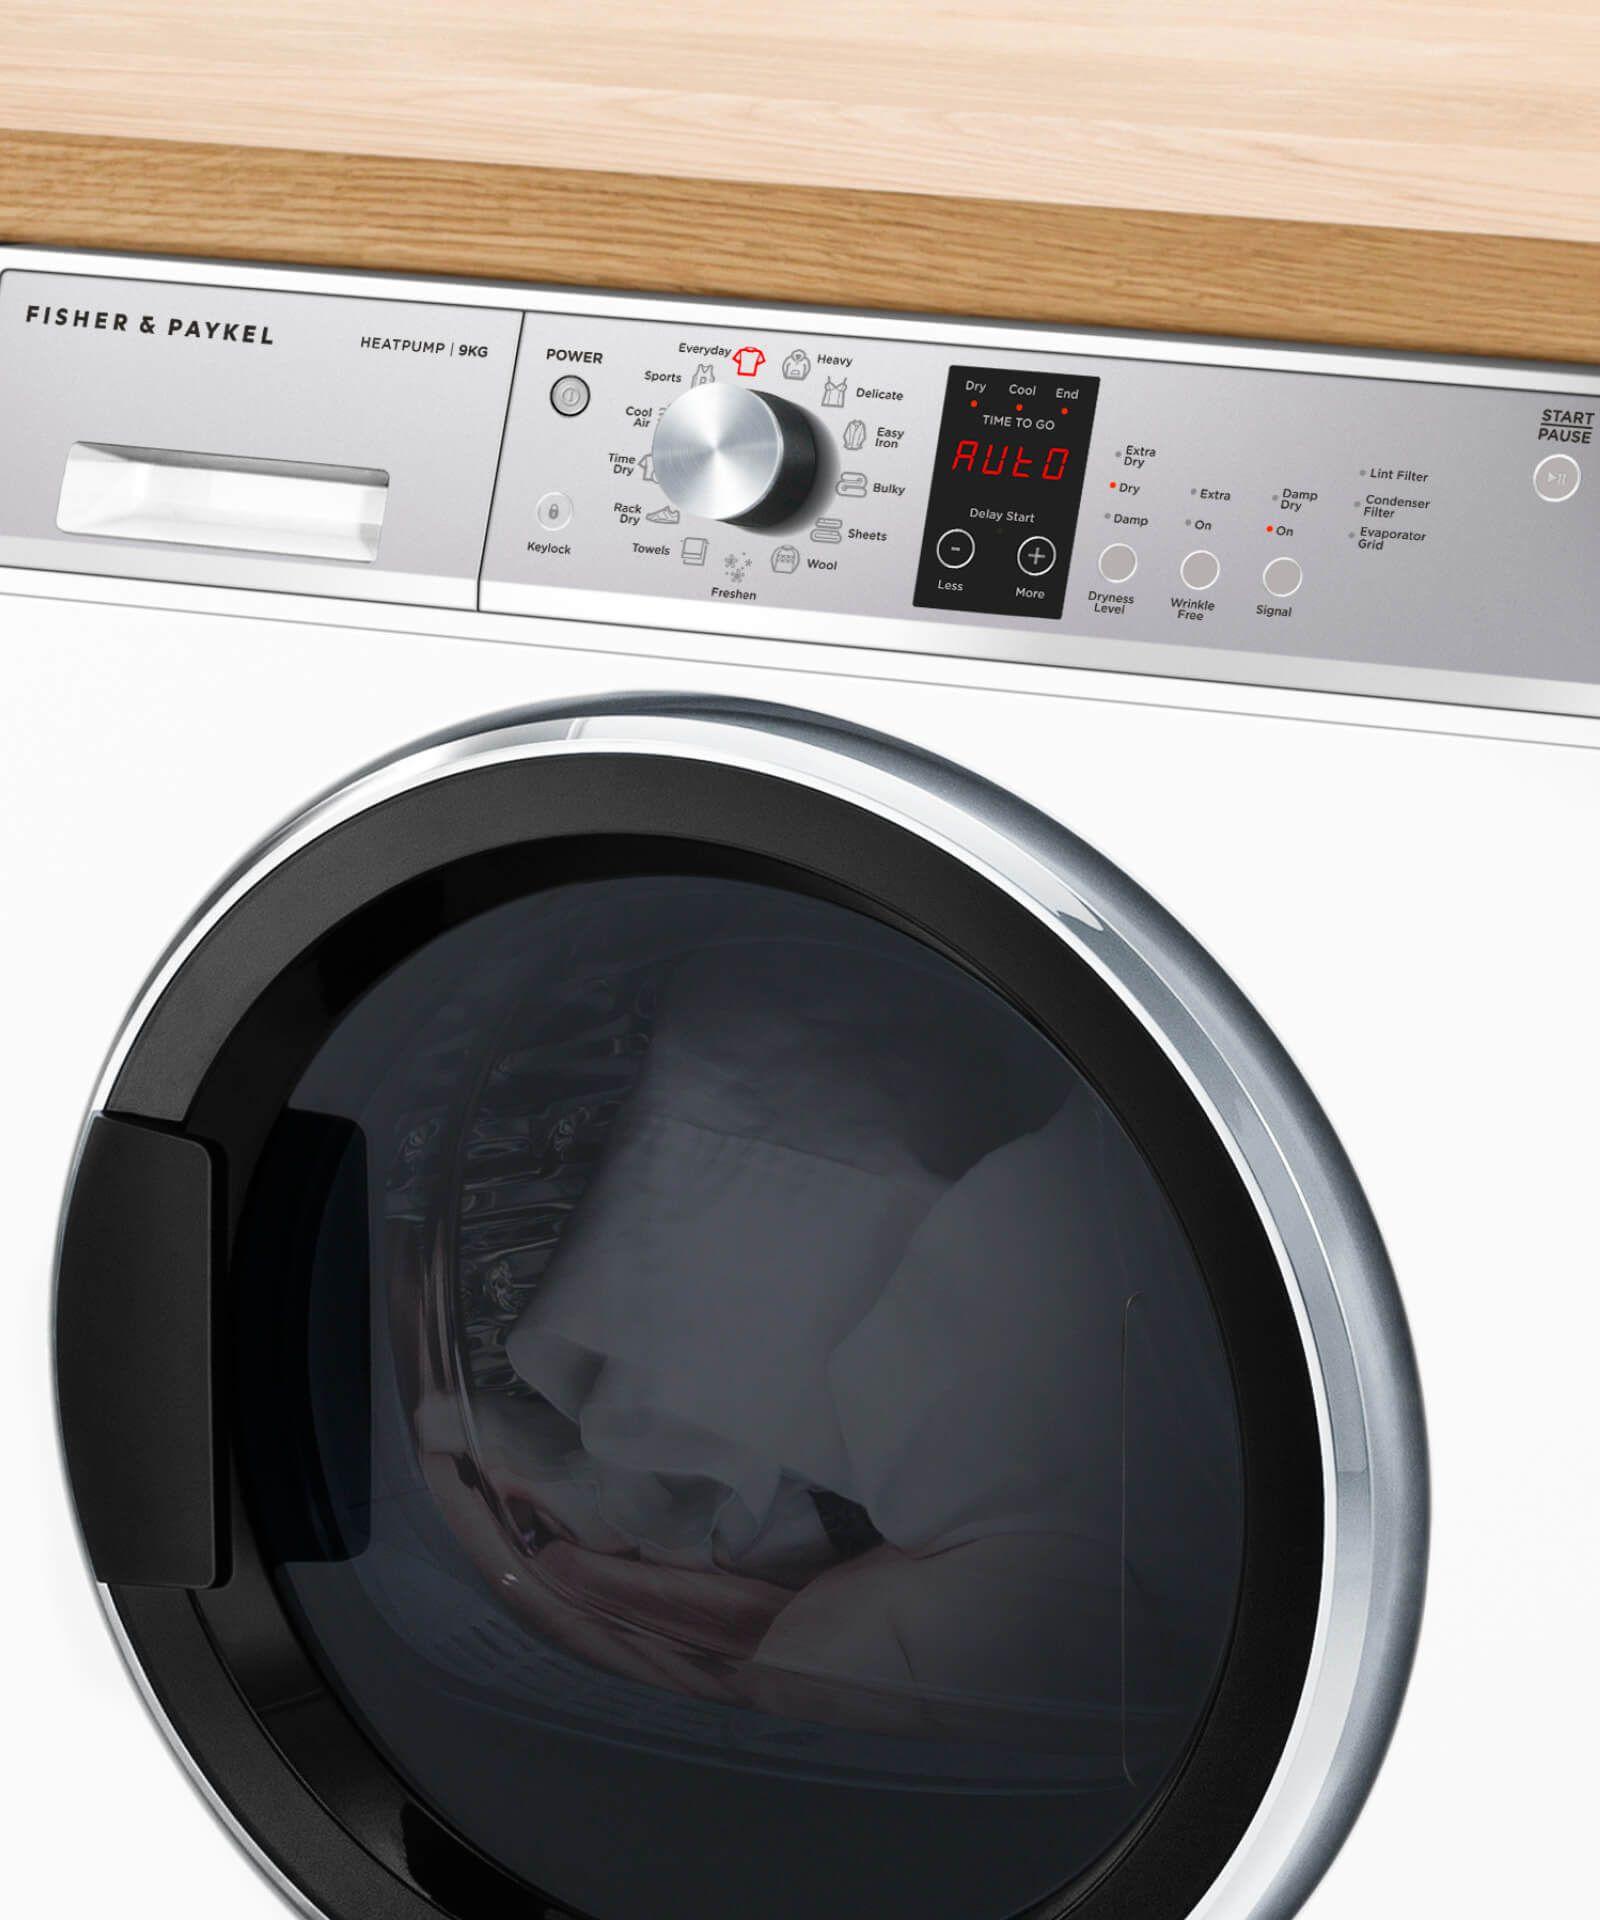 Dh9060p1 Heatpump Condensing Dryer 9kg Fisher Paykel Au Heat Pump Stainless Steel Drum Drying Towels